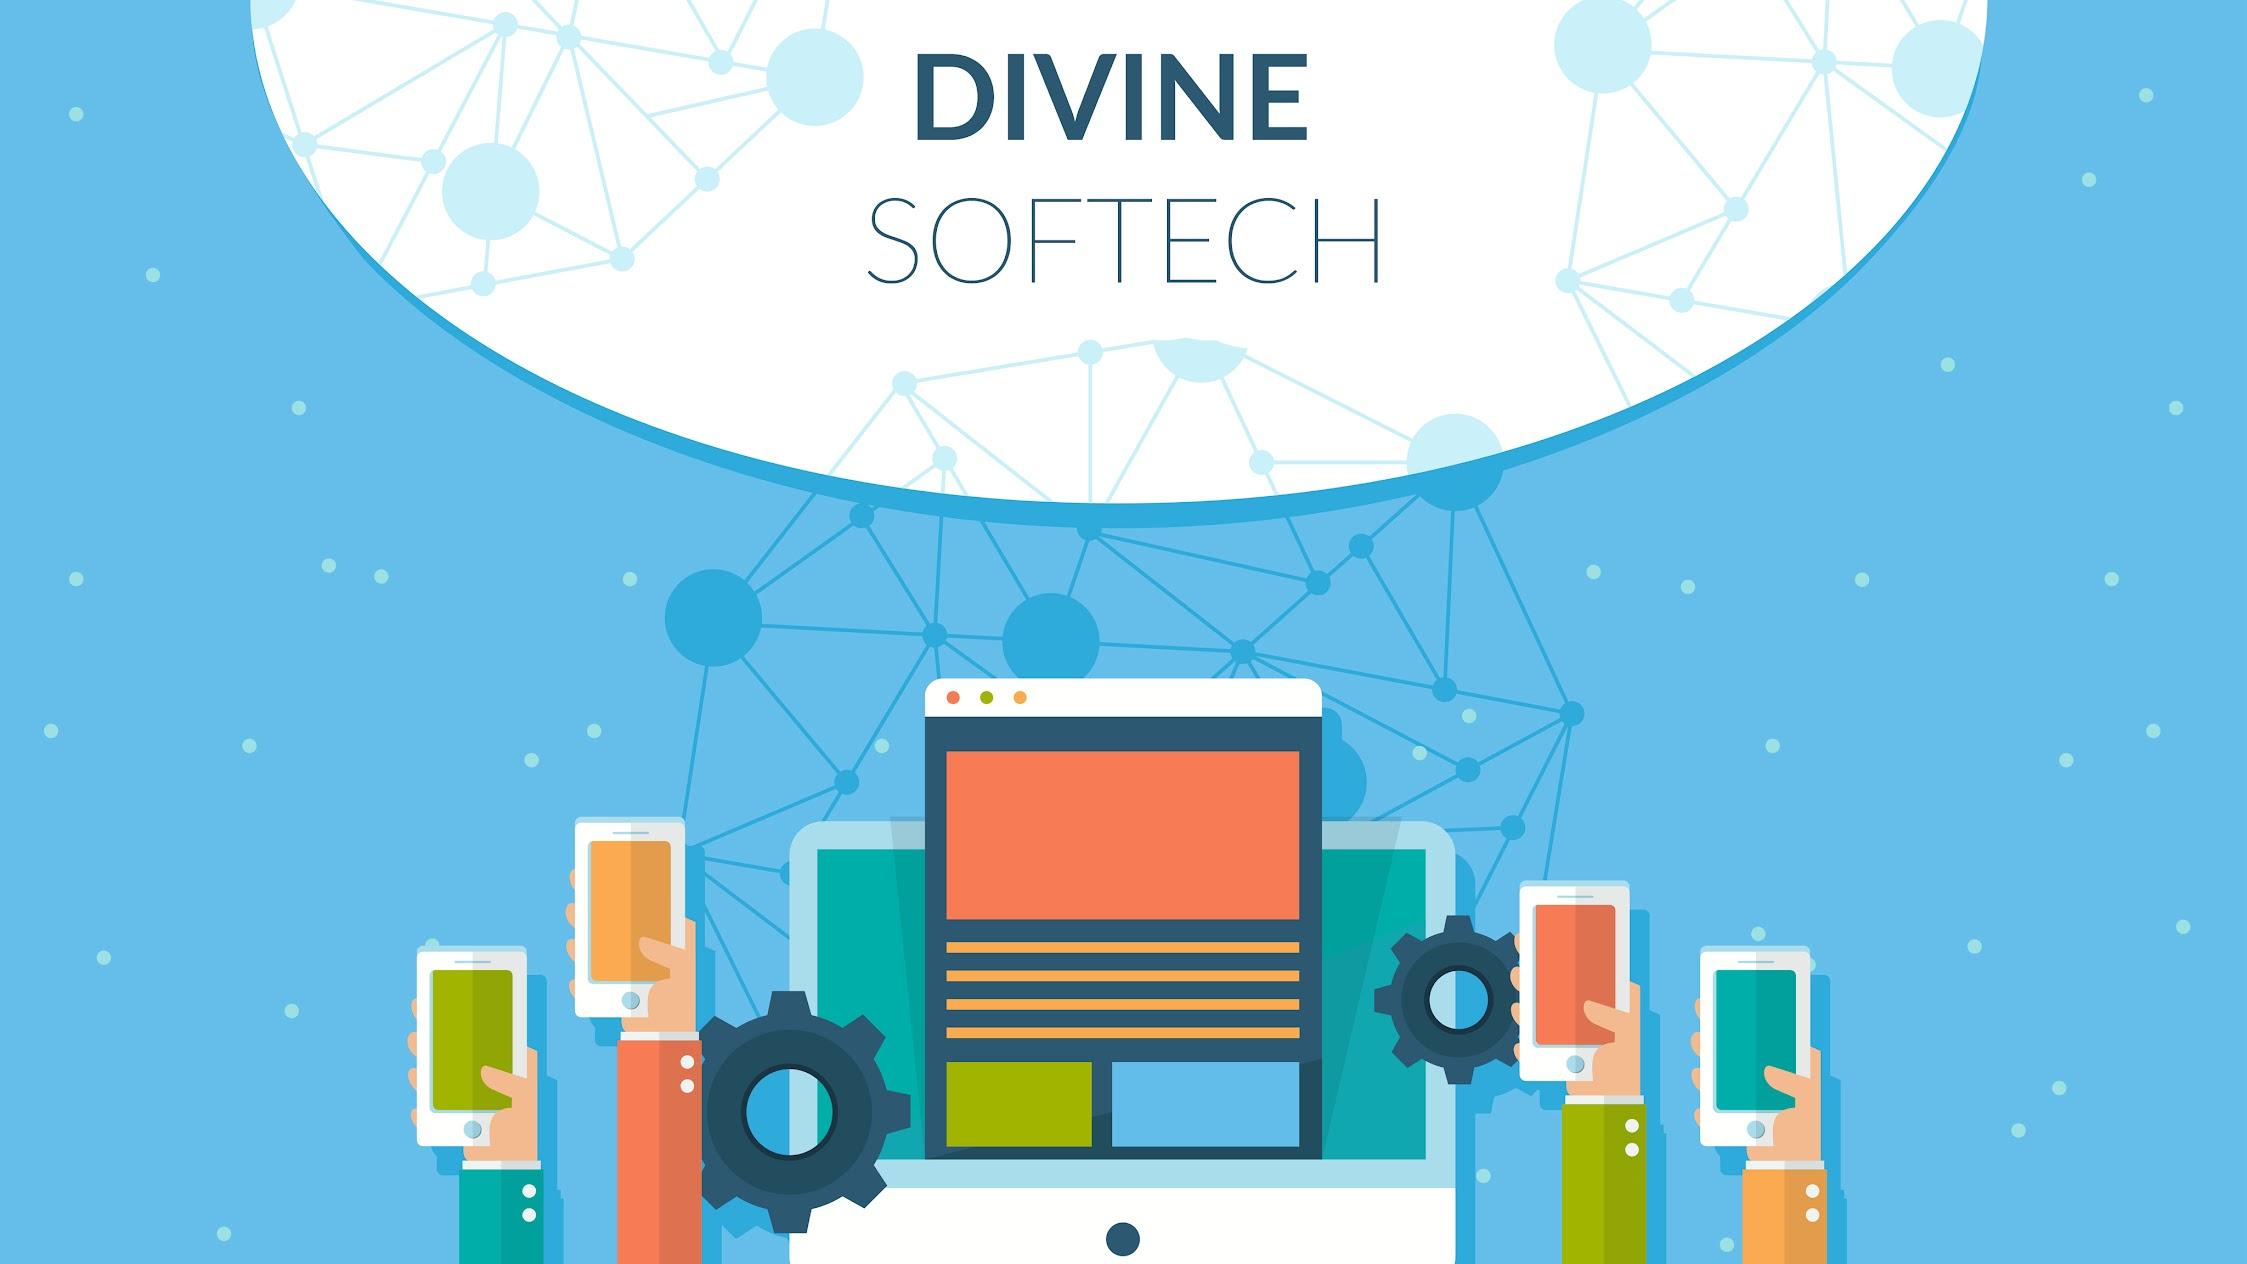 Divine Softech